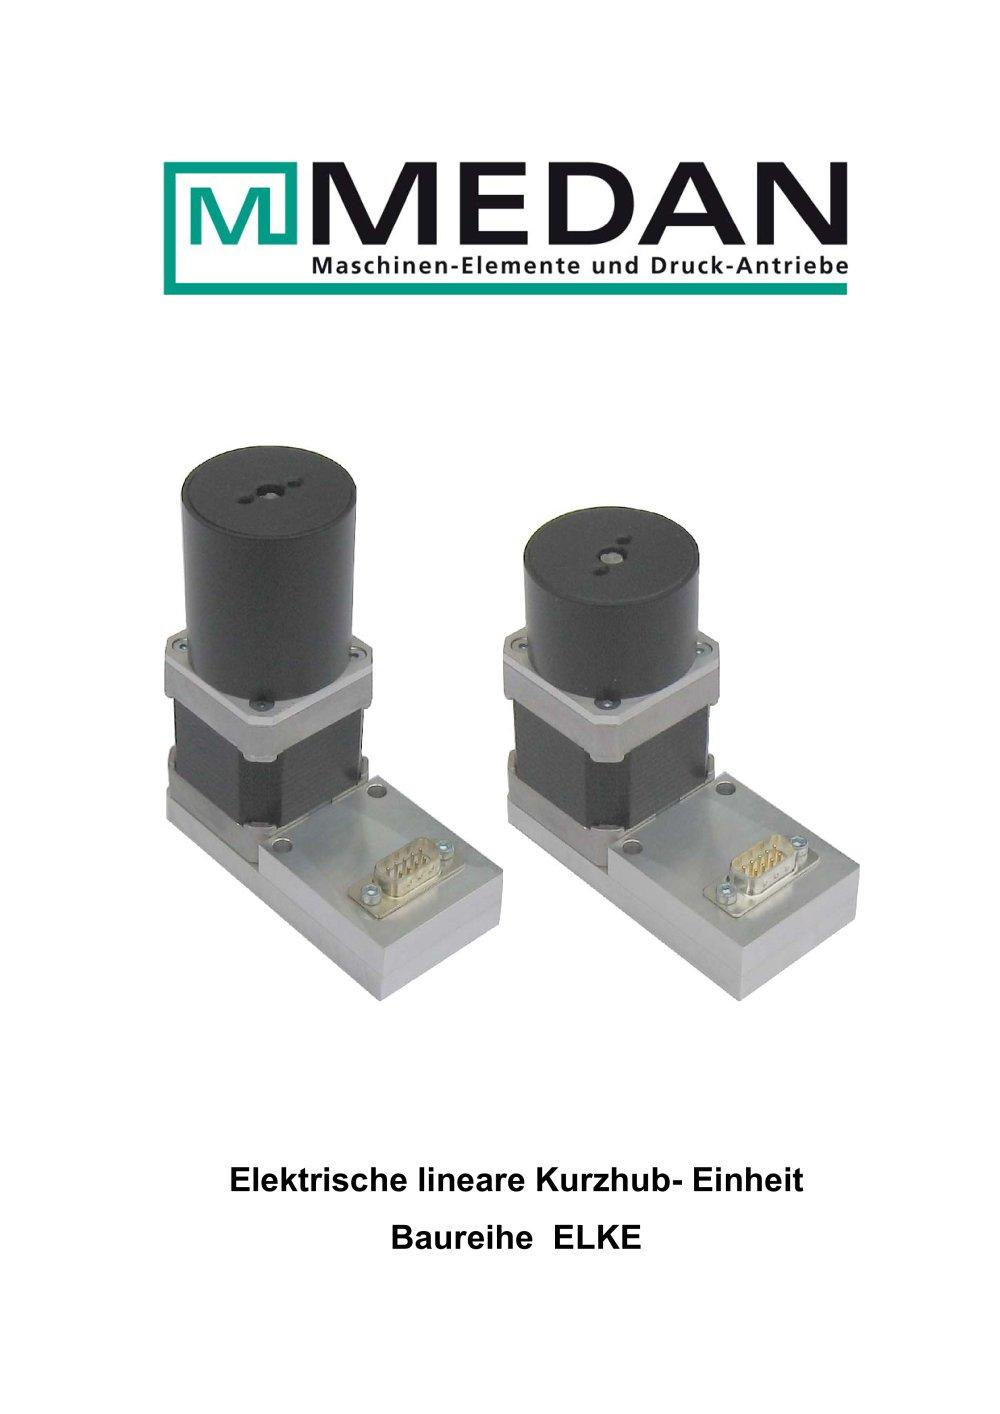 Elektrische lineare Kurzhub- Einheit Baureihe ELKE - MEDAN - PDF ...